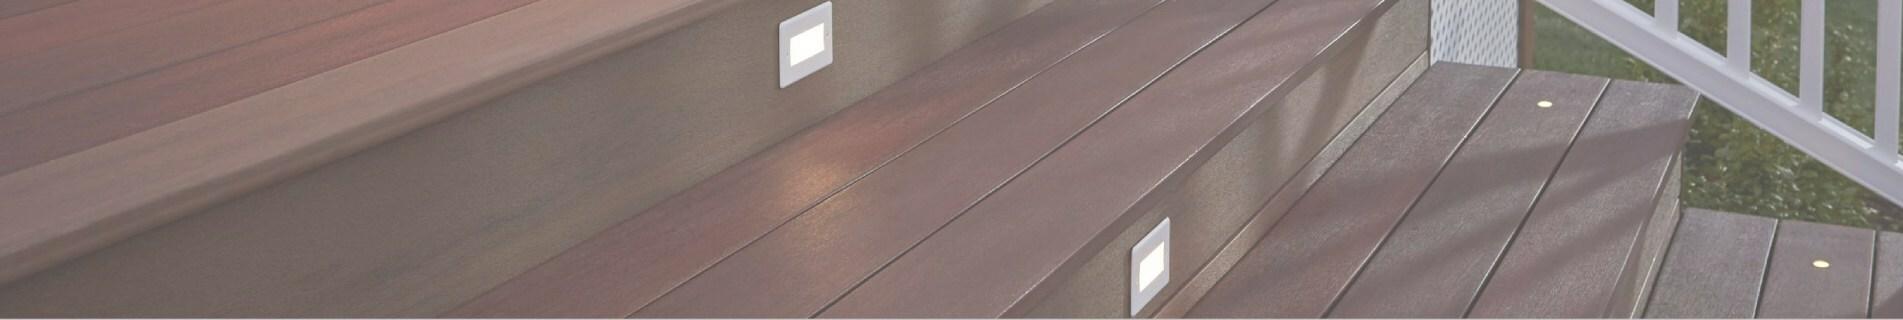 Deck and Step Lighting